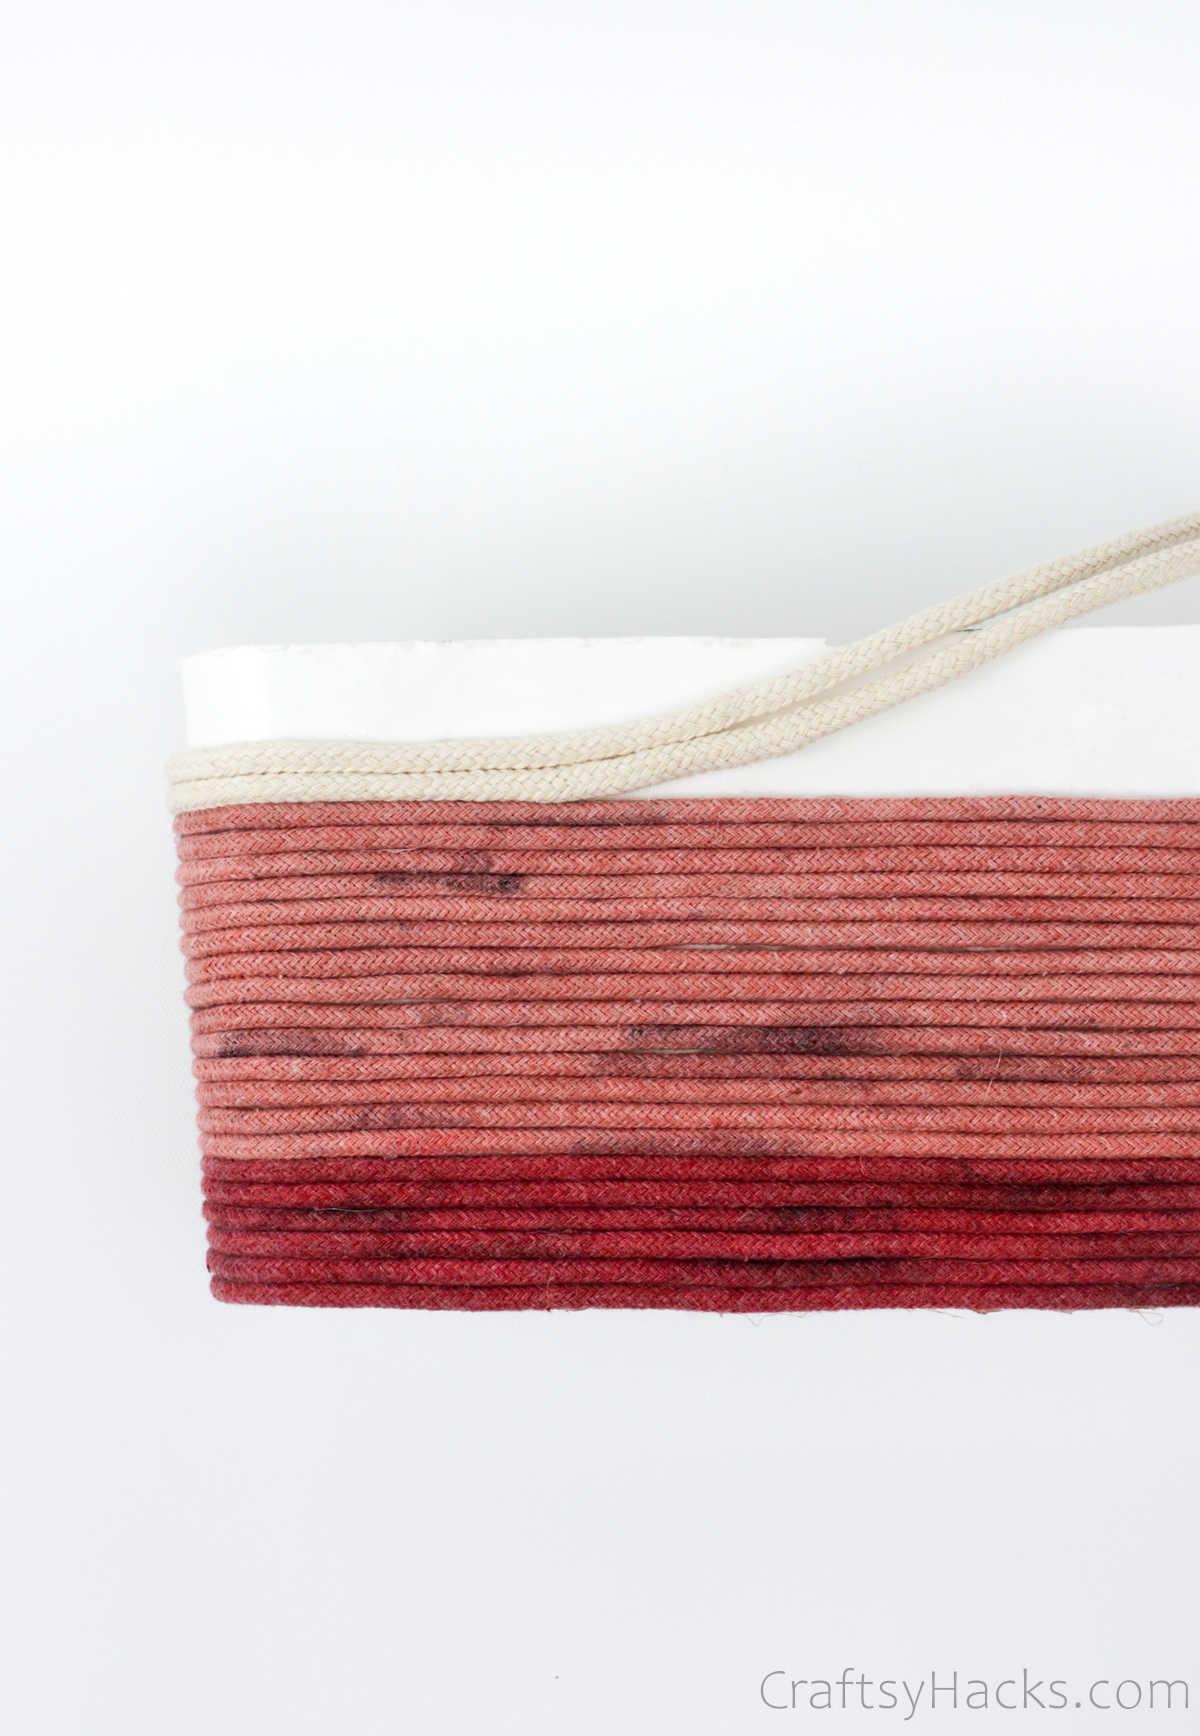 adding third colour of rope